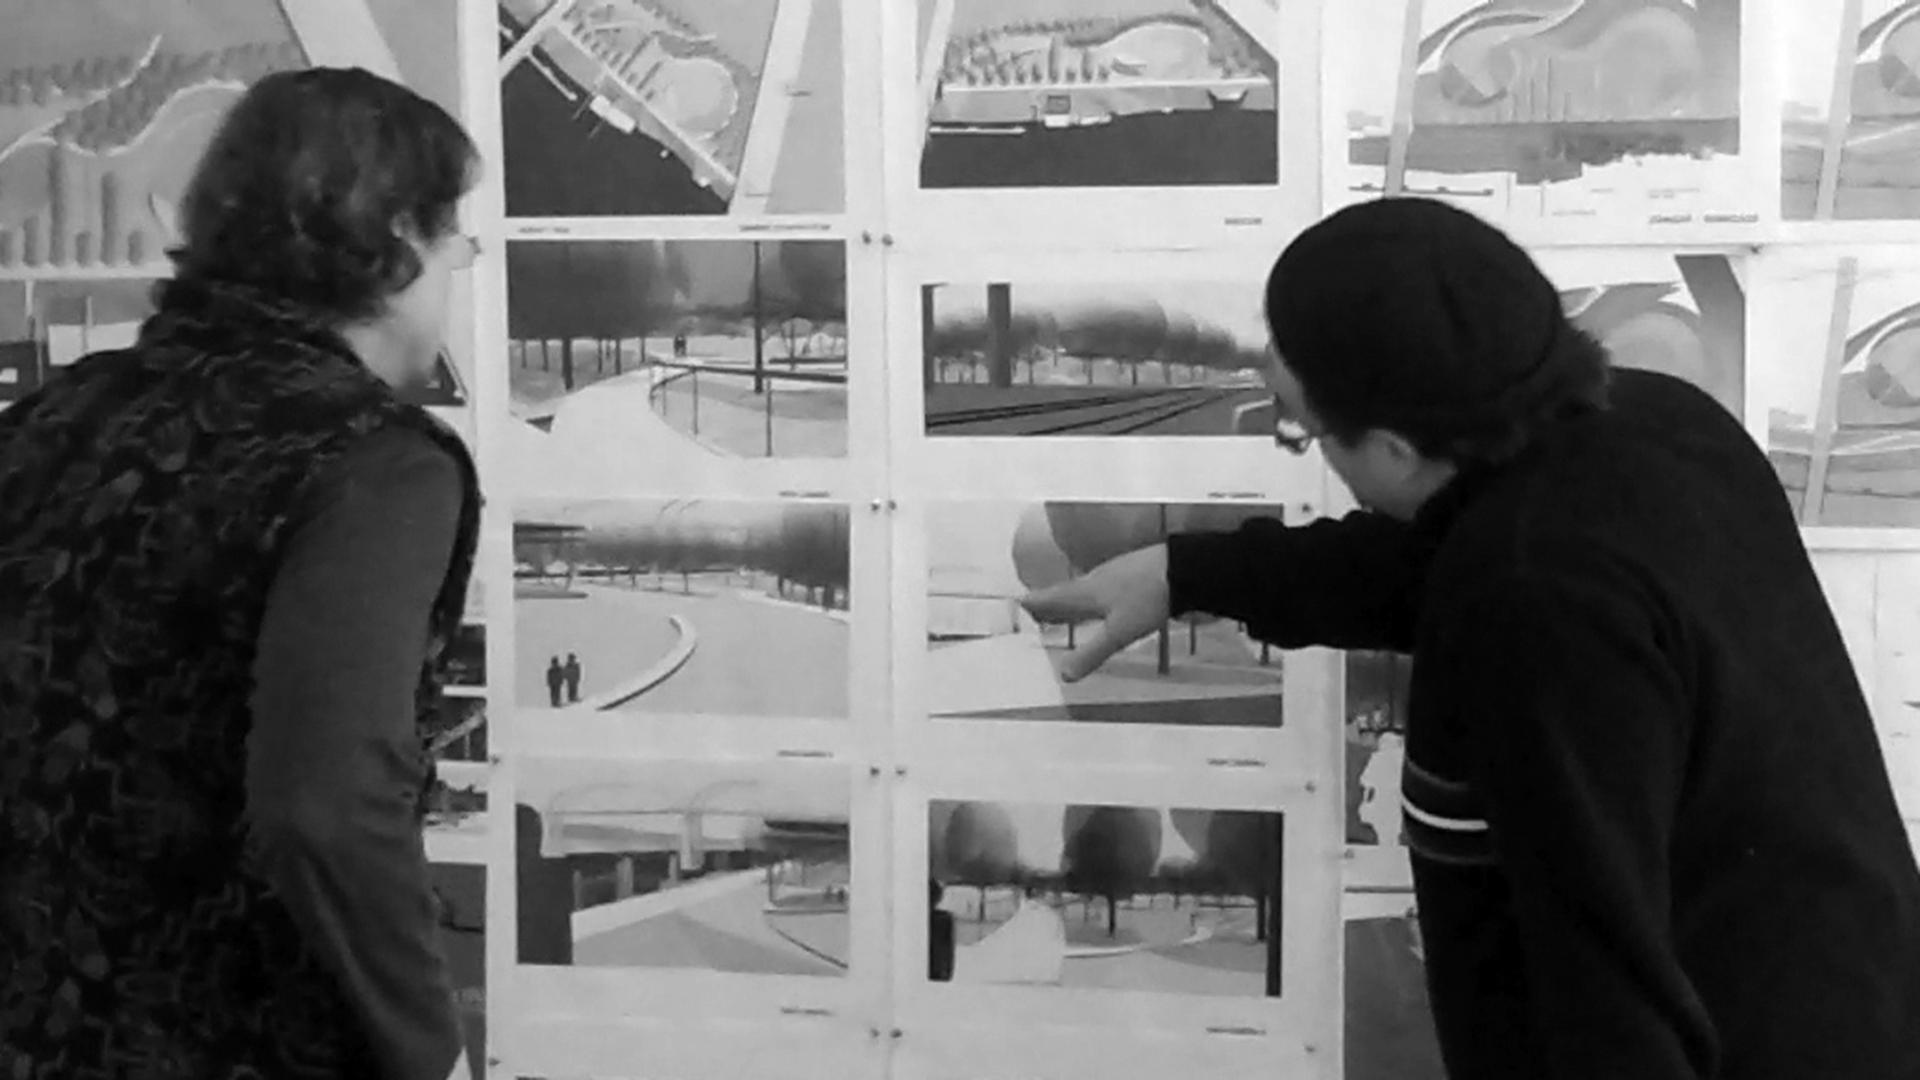 NRF 2010_0212_Video 01 studio work.00_09_35_29.Still012.jpg